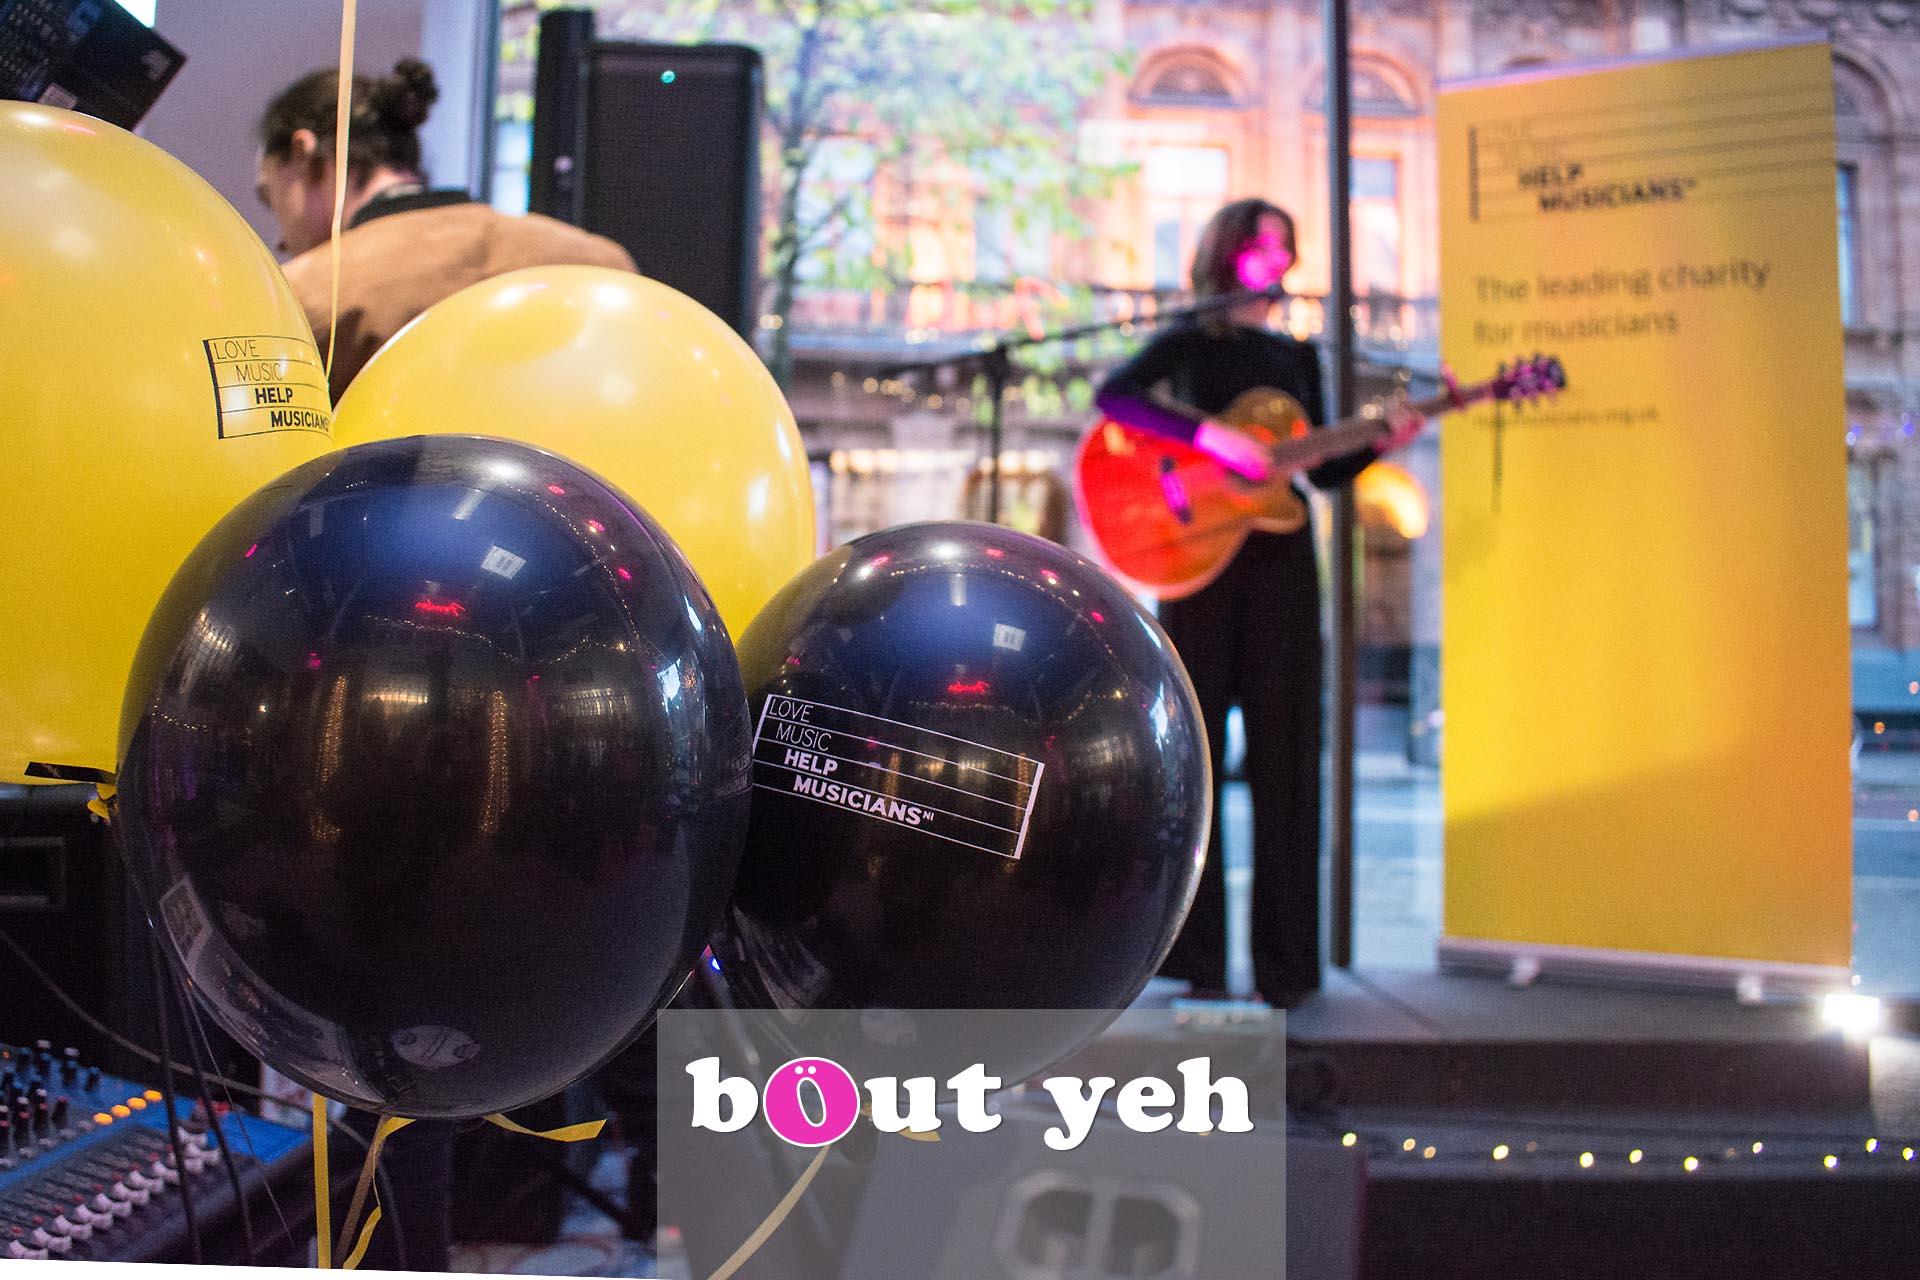 Rosie Carney singer concert at Dawsons Musical Instruments in Belfast - photo 2850.